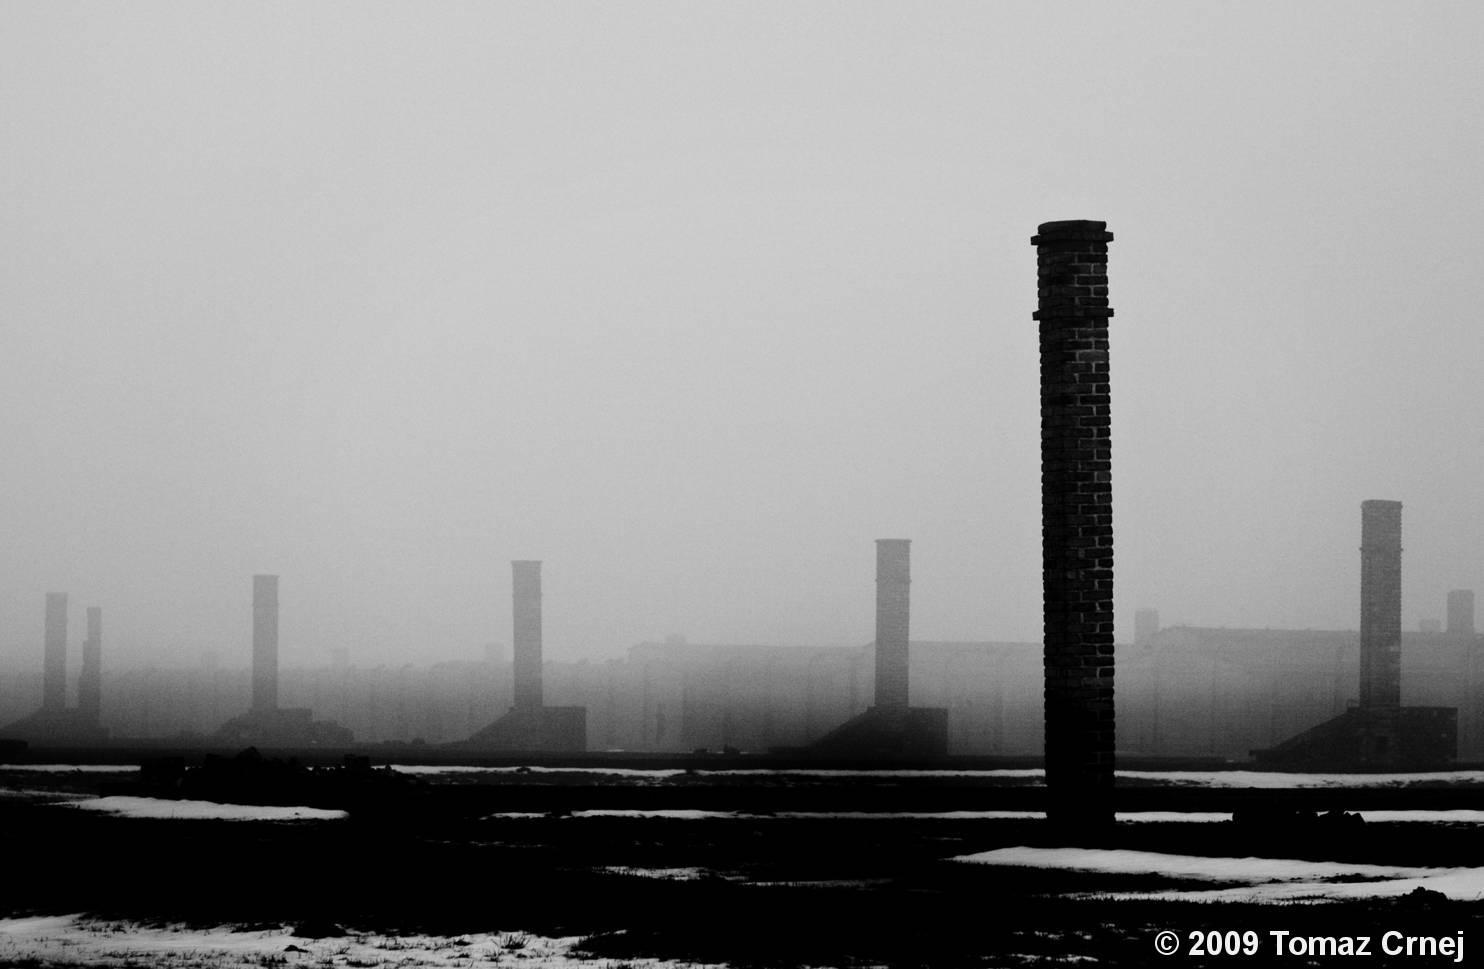 Sad landscape by thebigdog14 on DeviantArt